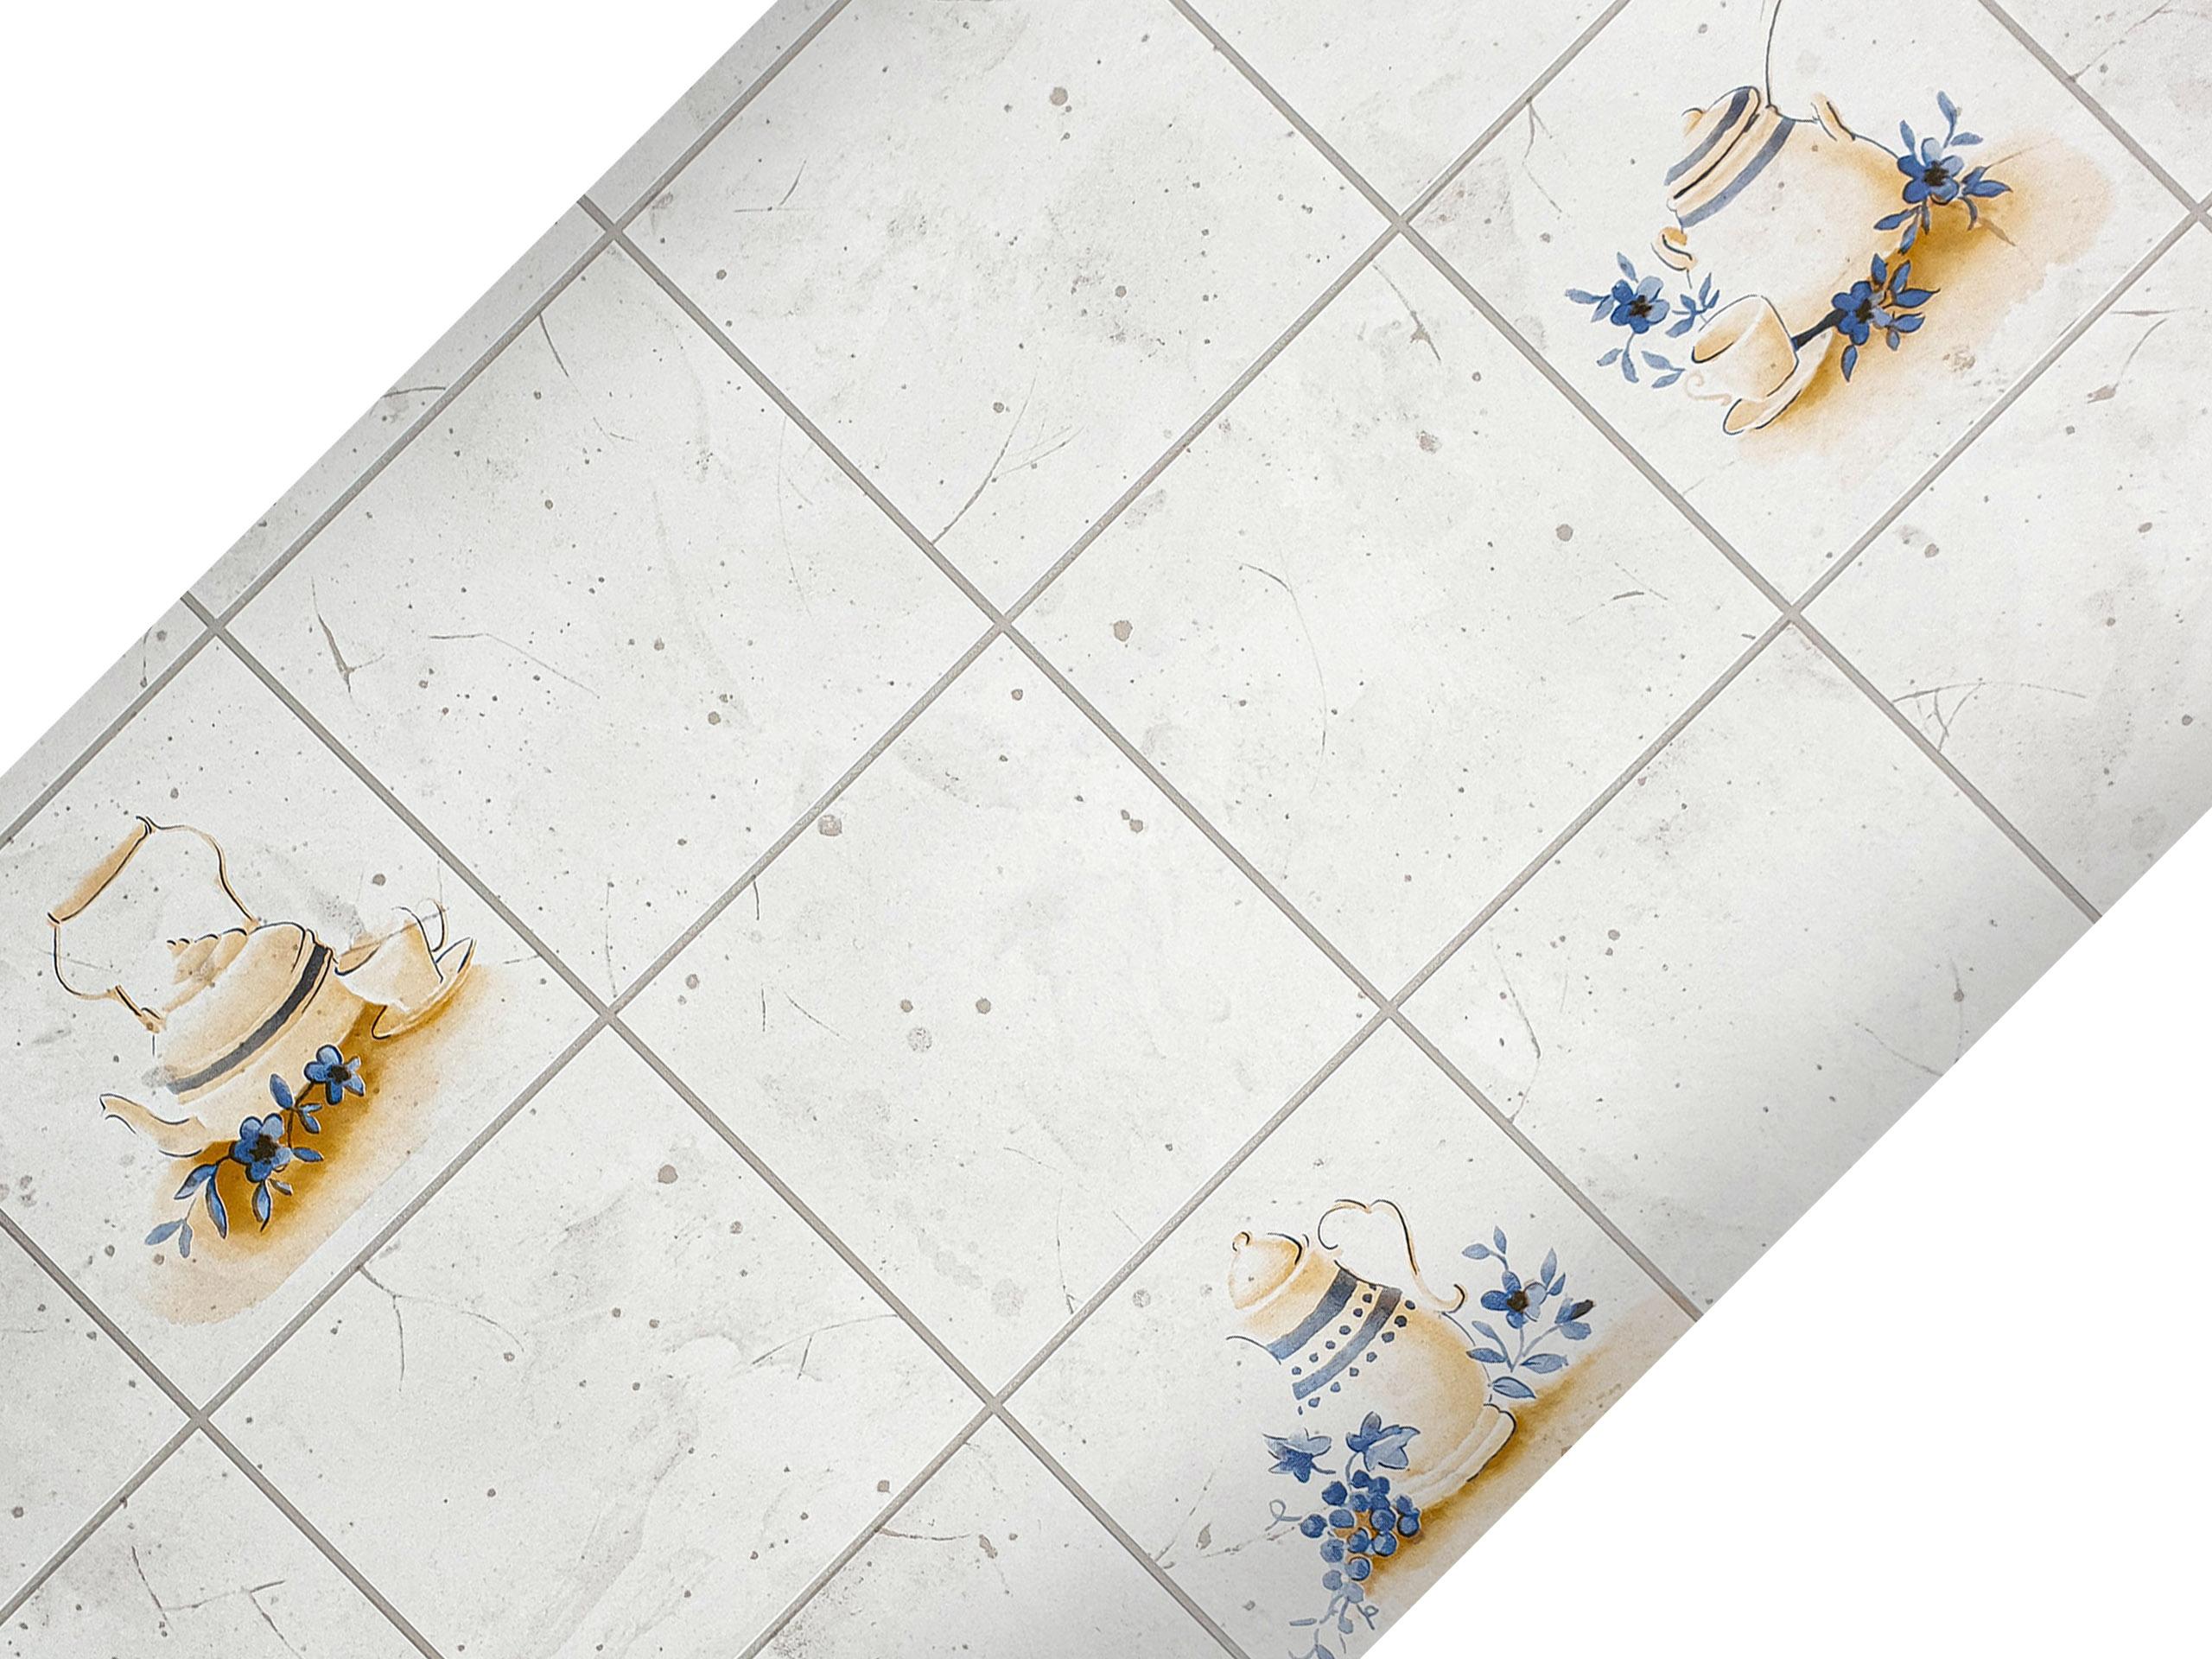 Selbstklebende Möbelfolie Küche Pot Beige dcfix Kachel Fliesenoptik Tapete Küche